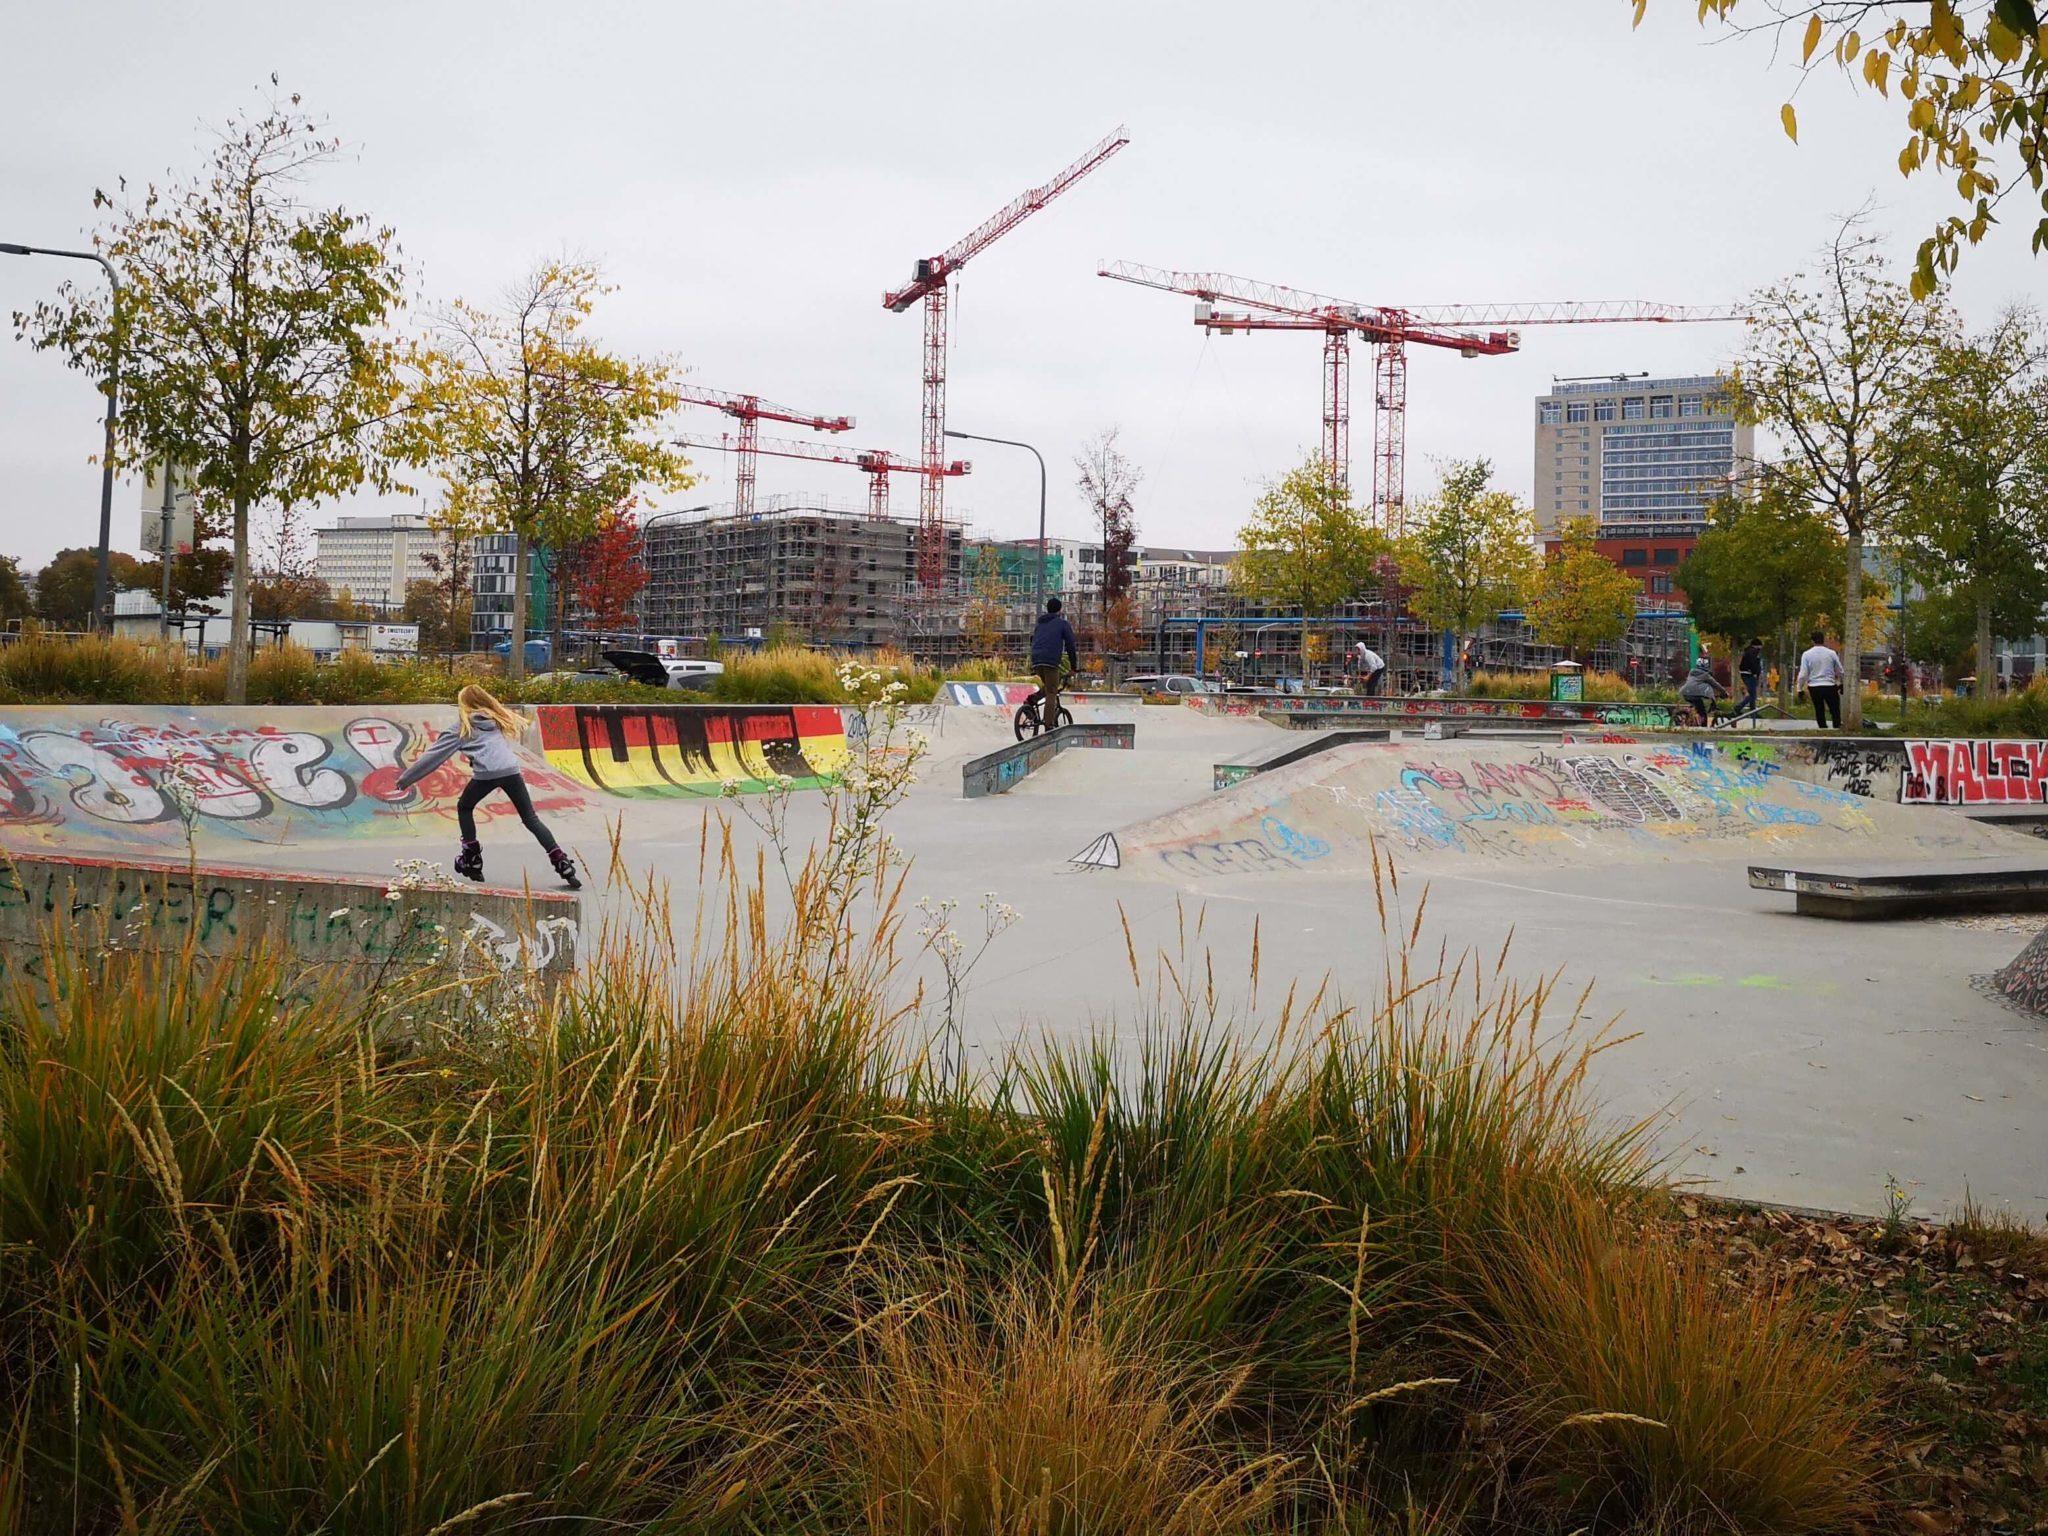 Skatepark Frankfurt Ostend